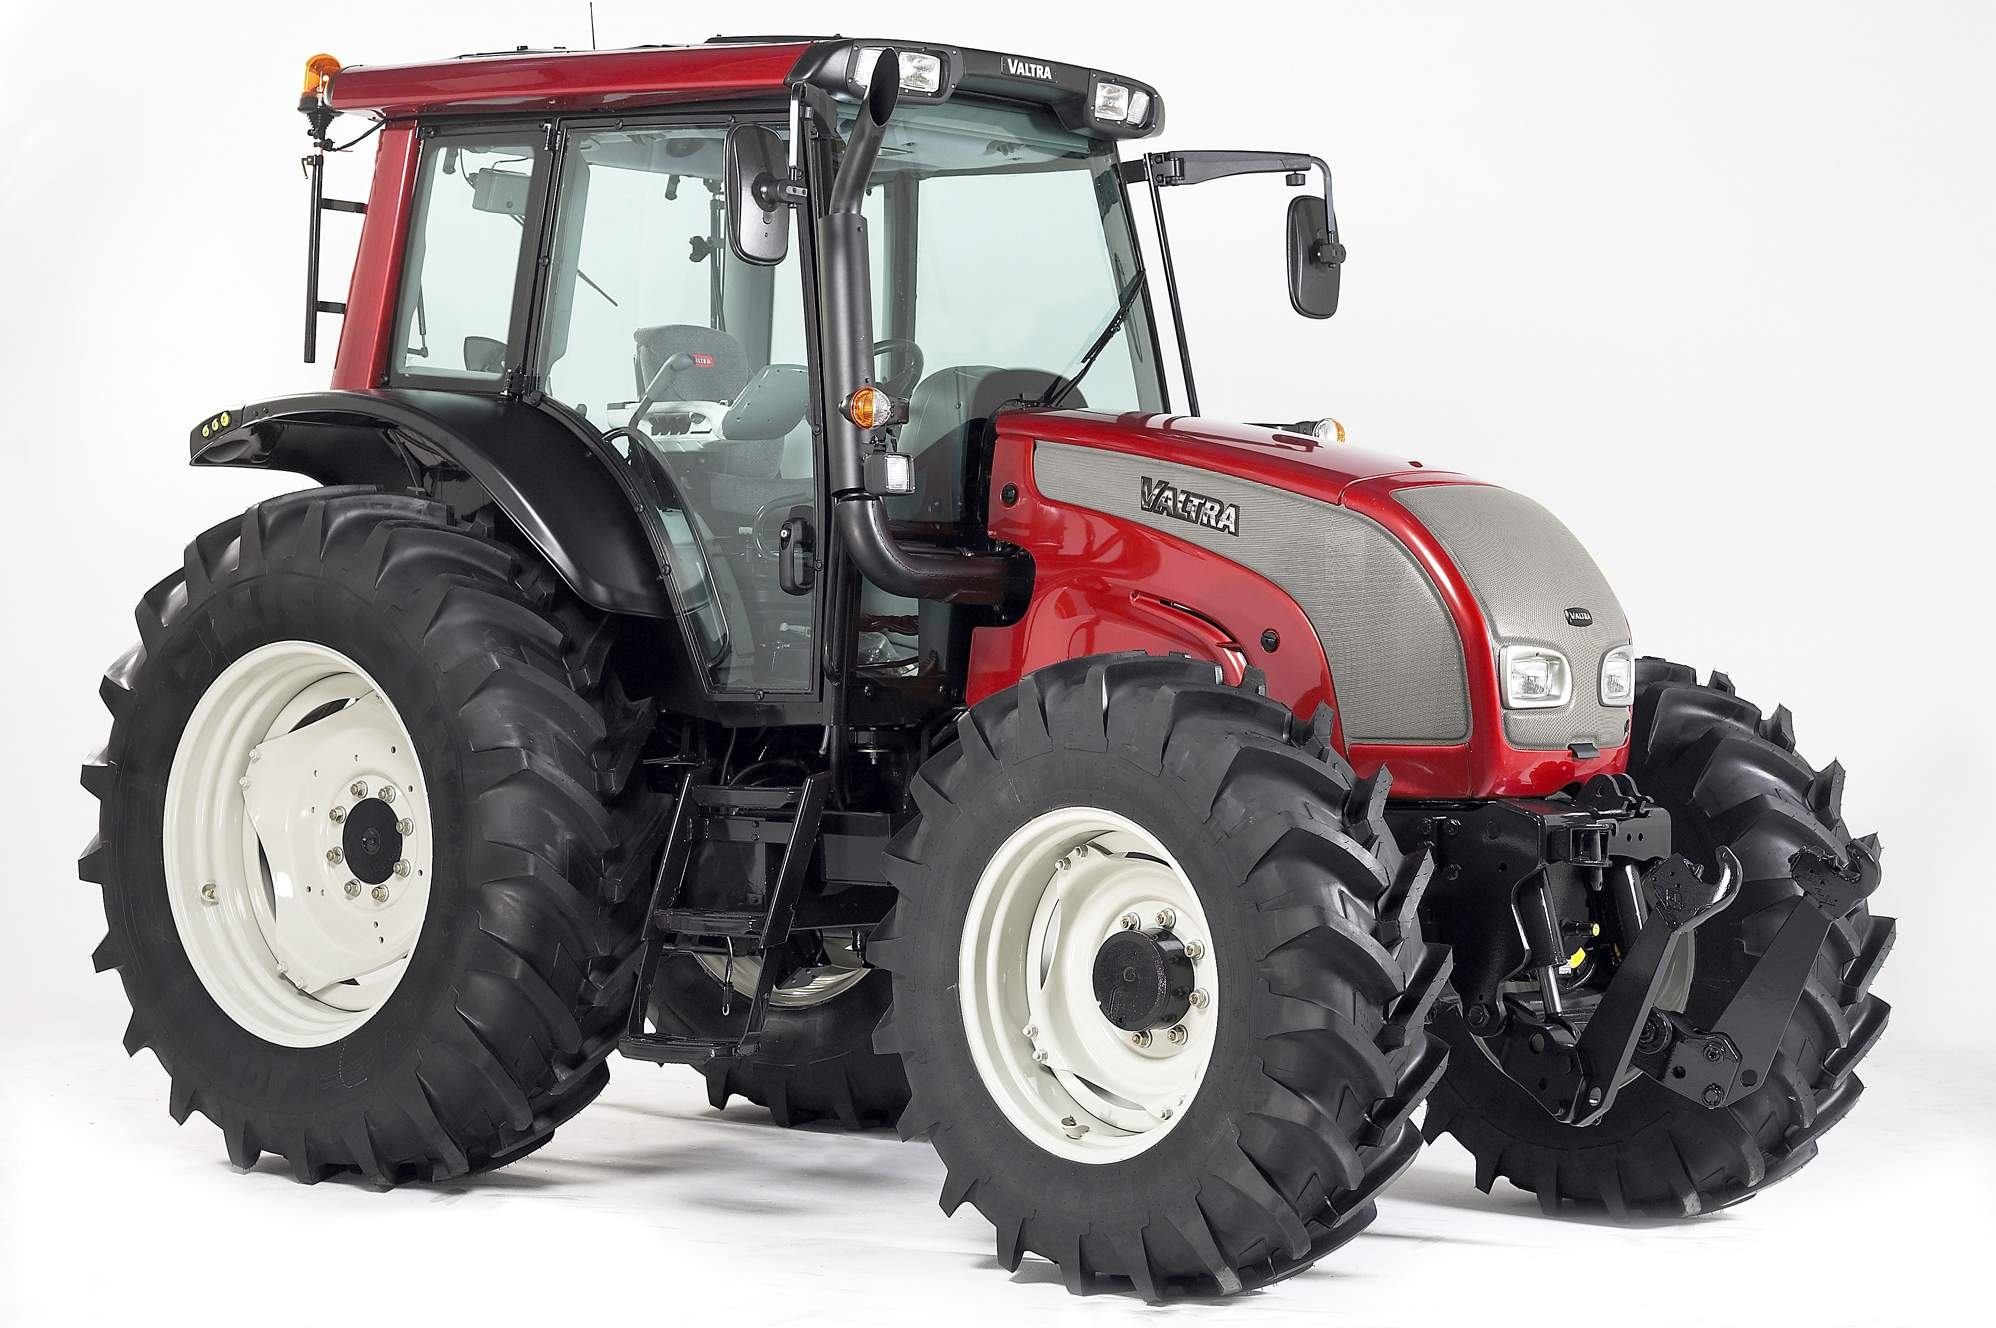 avis n 101 de la marque valtra tracteurs agricoles. Black Bedroom Furniture Sets. Home Design Ideas